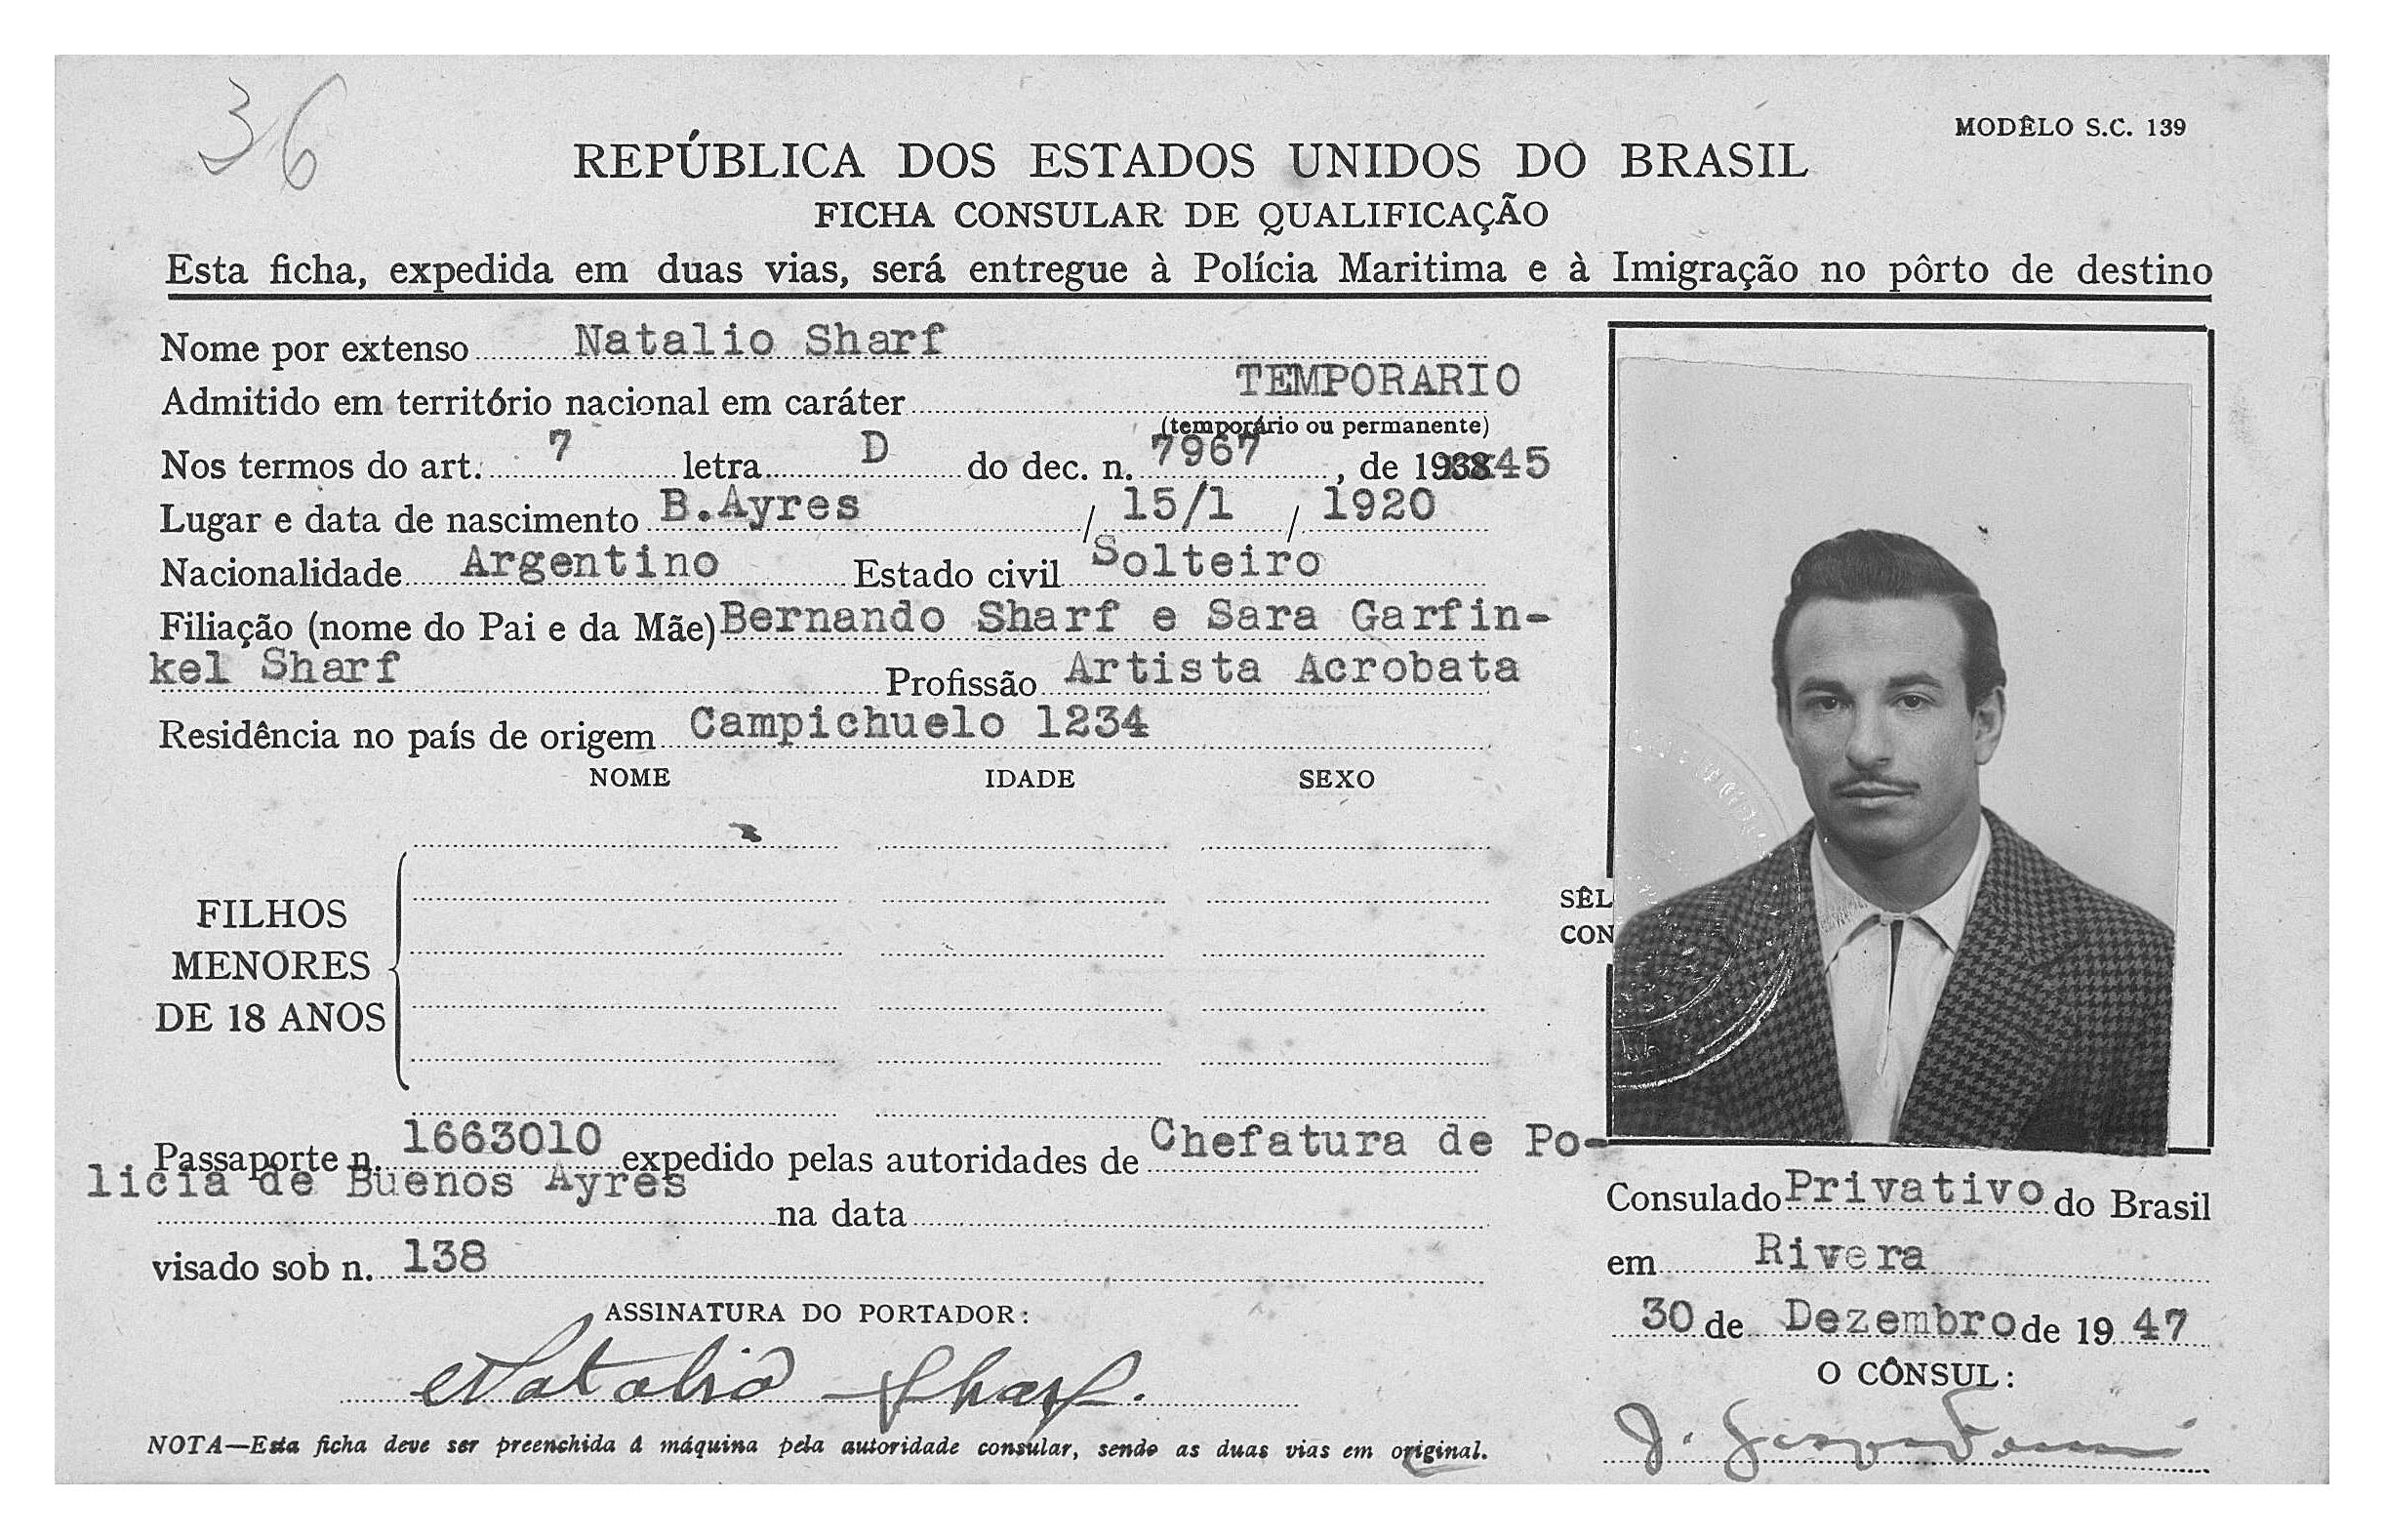 1947-12 - ficha consular - RJ - 01 copy